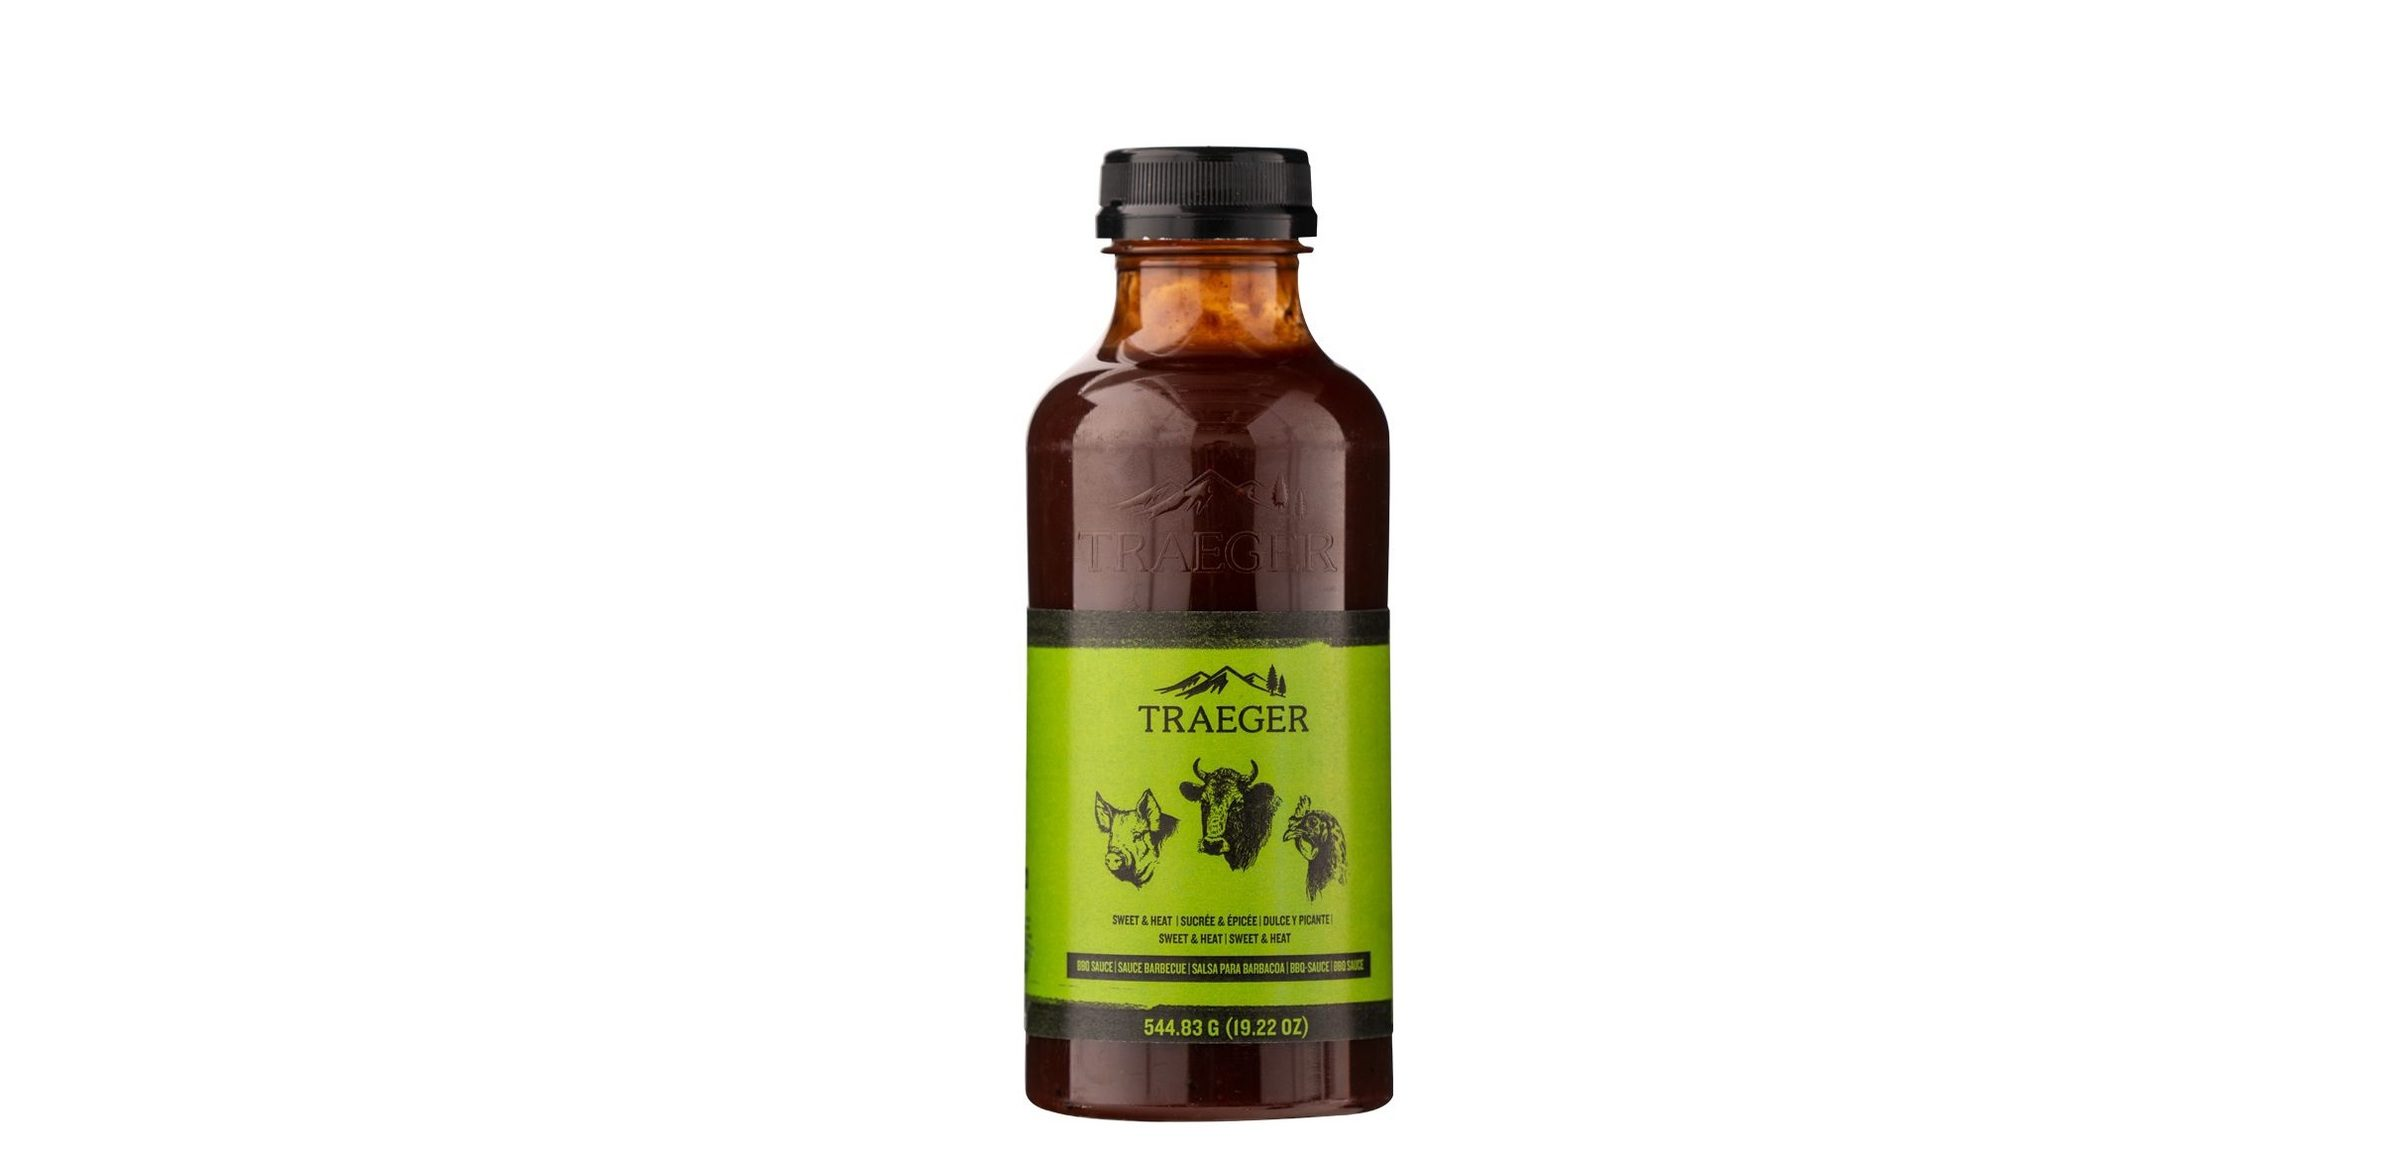 Traeger Sweet Heat Bbq Sauce